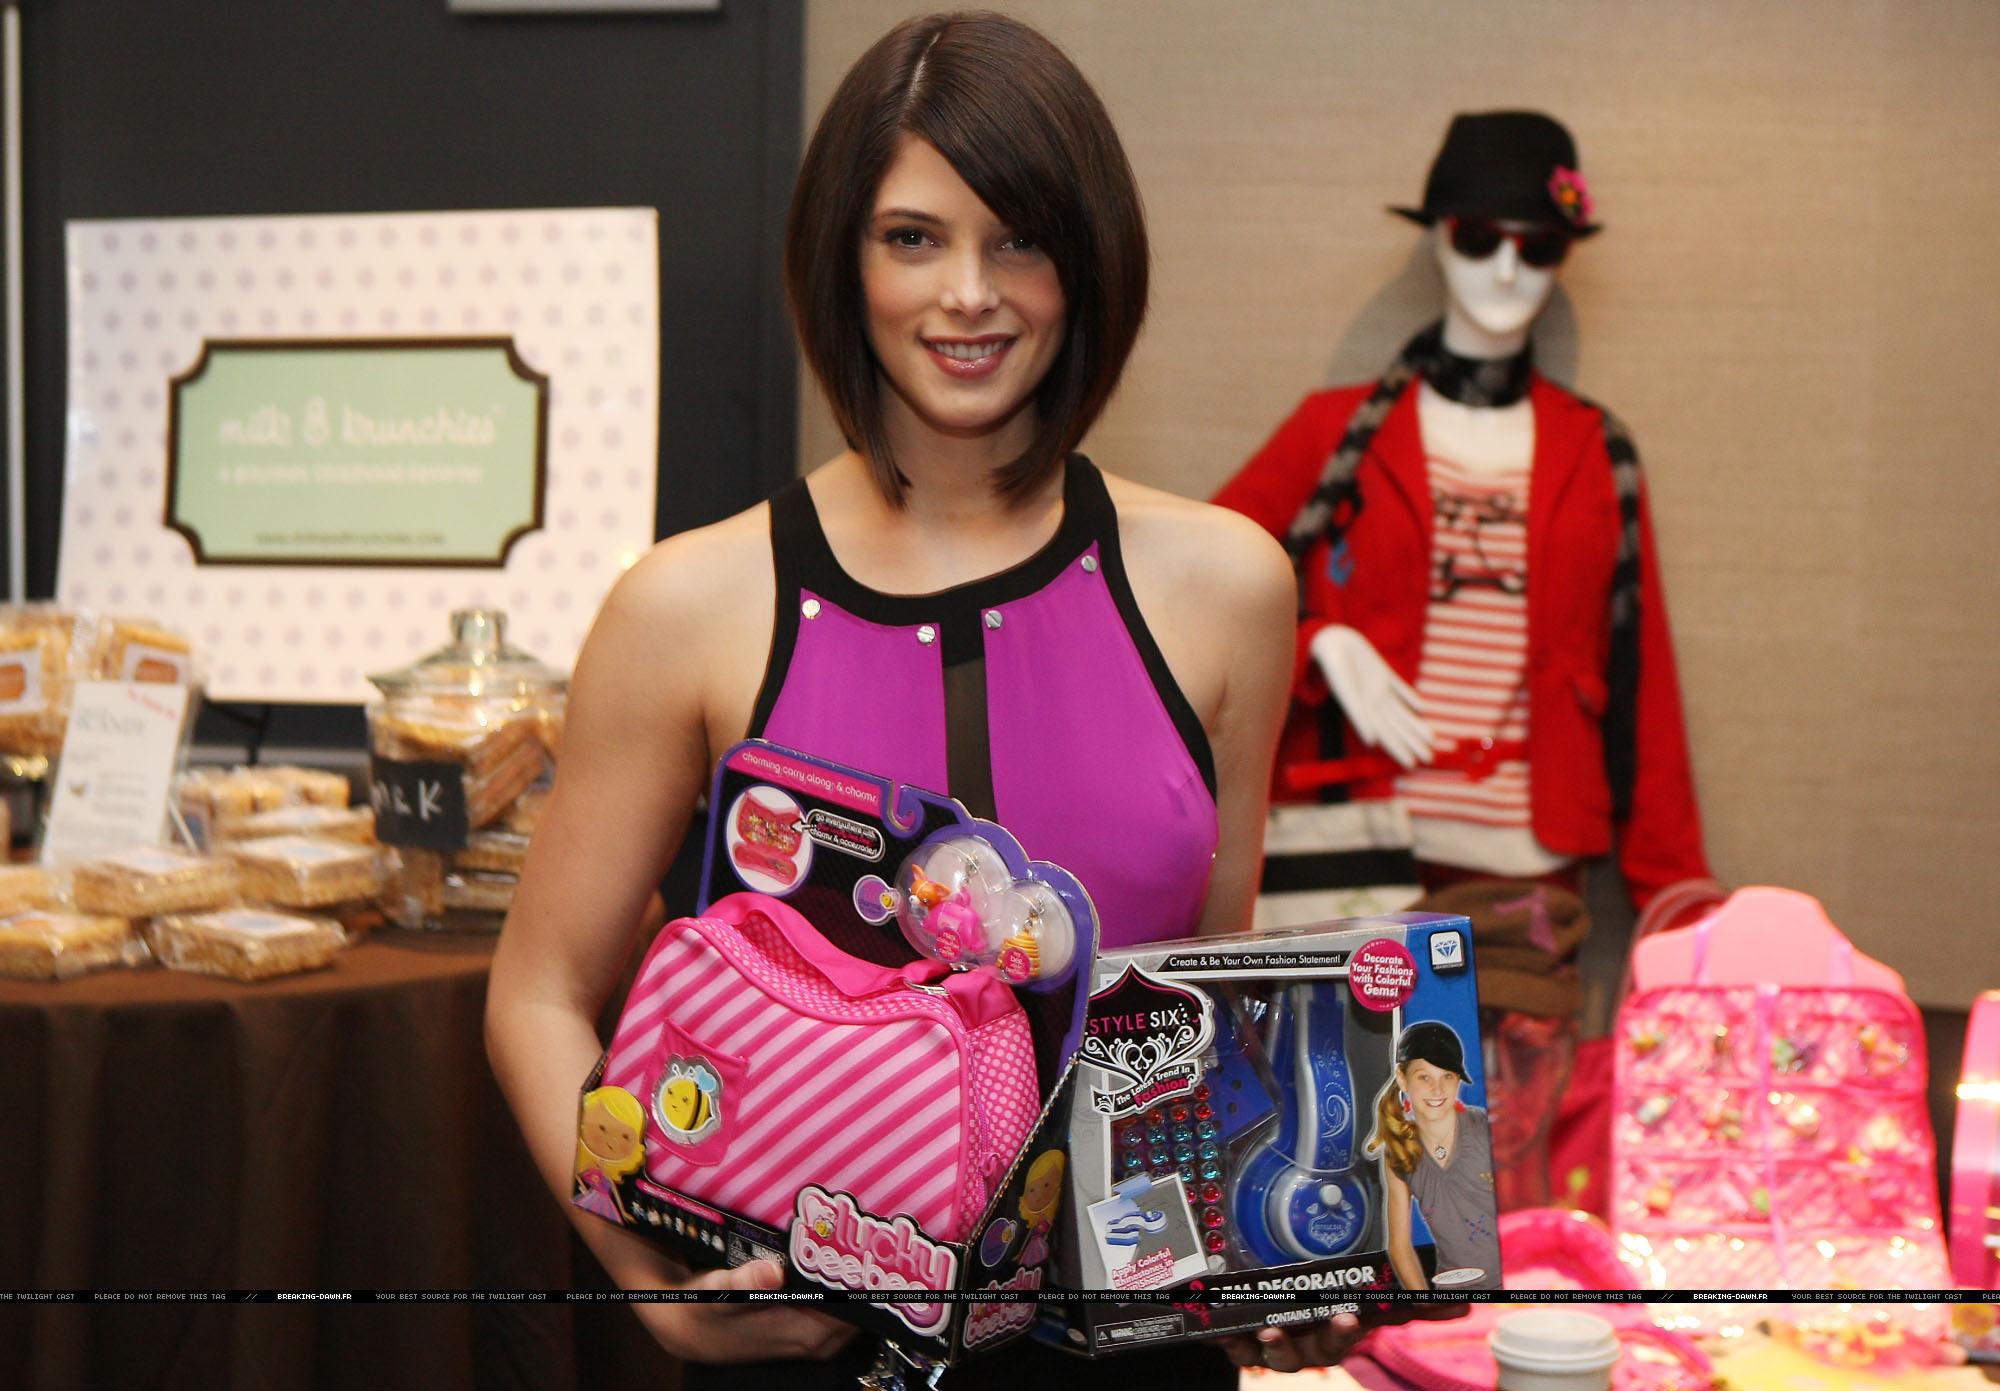 Ashley @ 102.7 KIIS-FM gifting lounge for the Teen Choice Awards